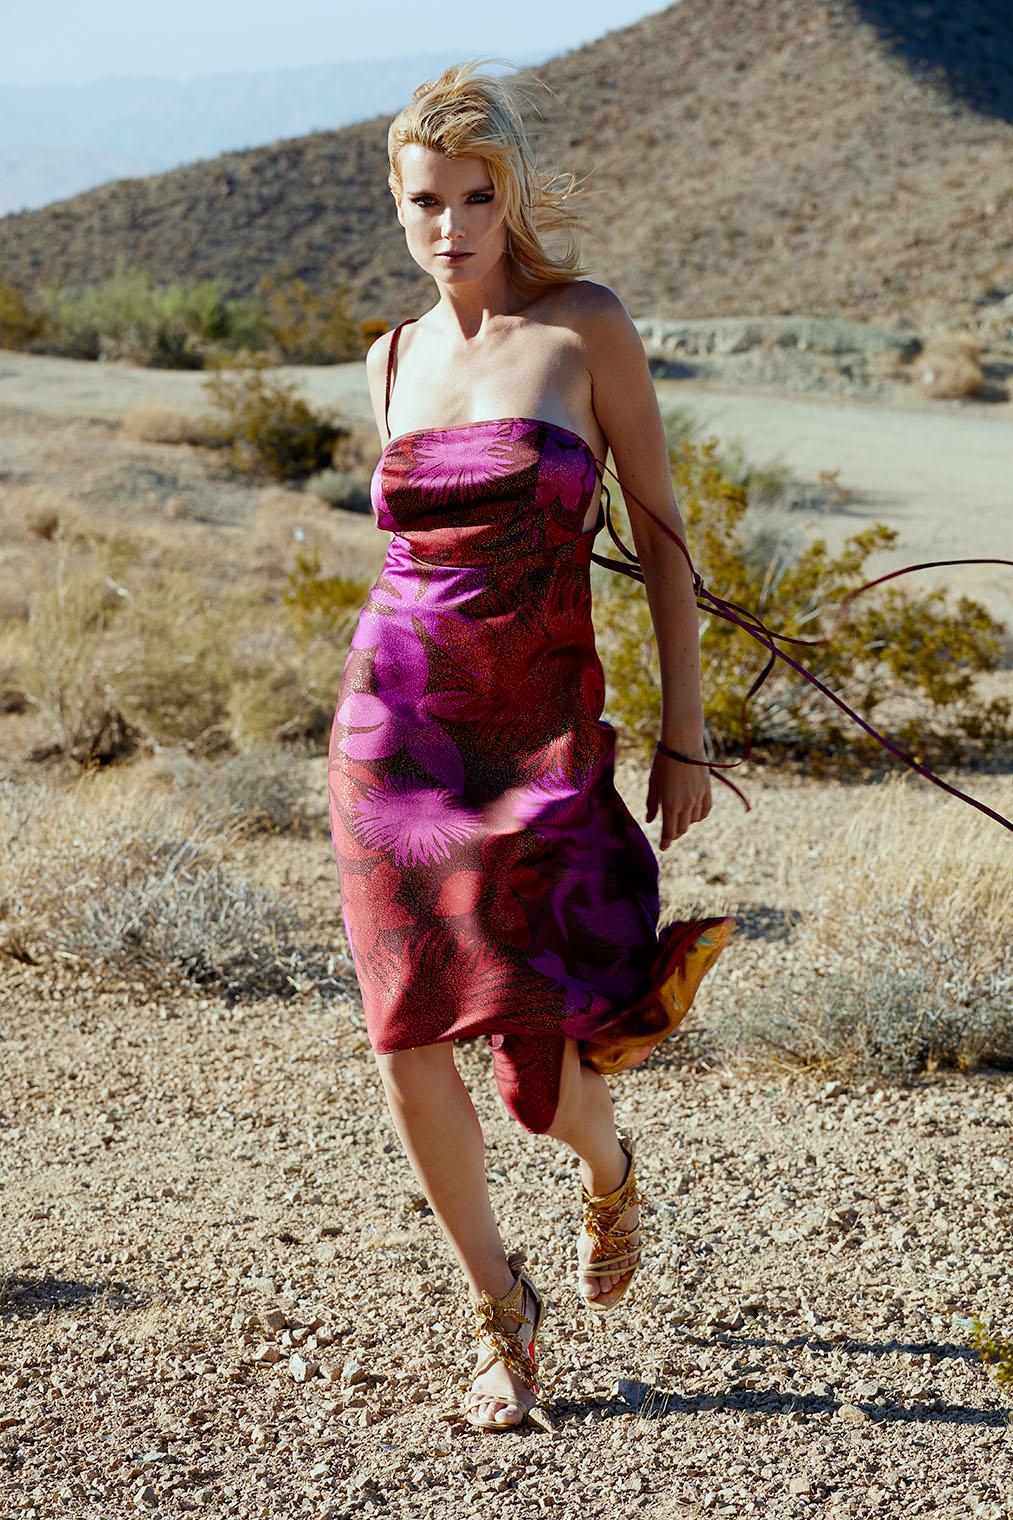 woman in silk dress walking the desert in purple silk dress in fashion advertising campaign, Palm Springs California